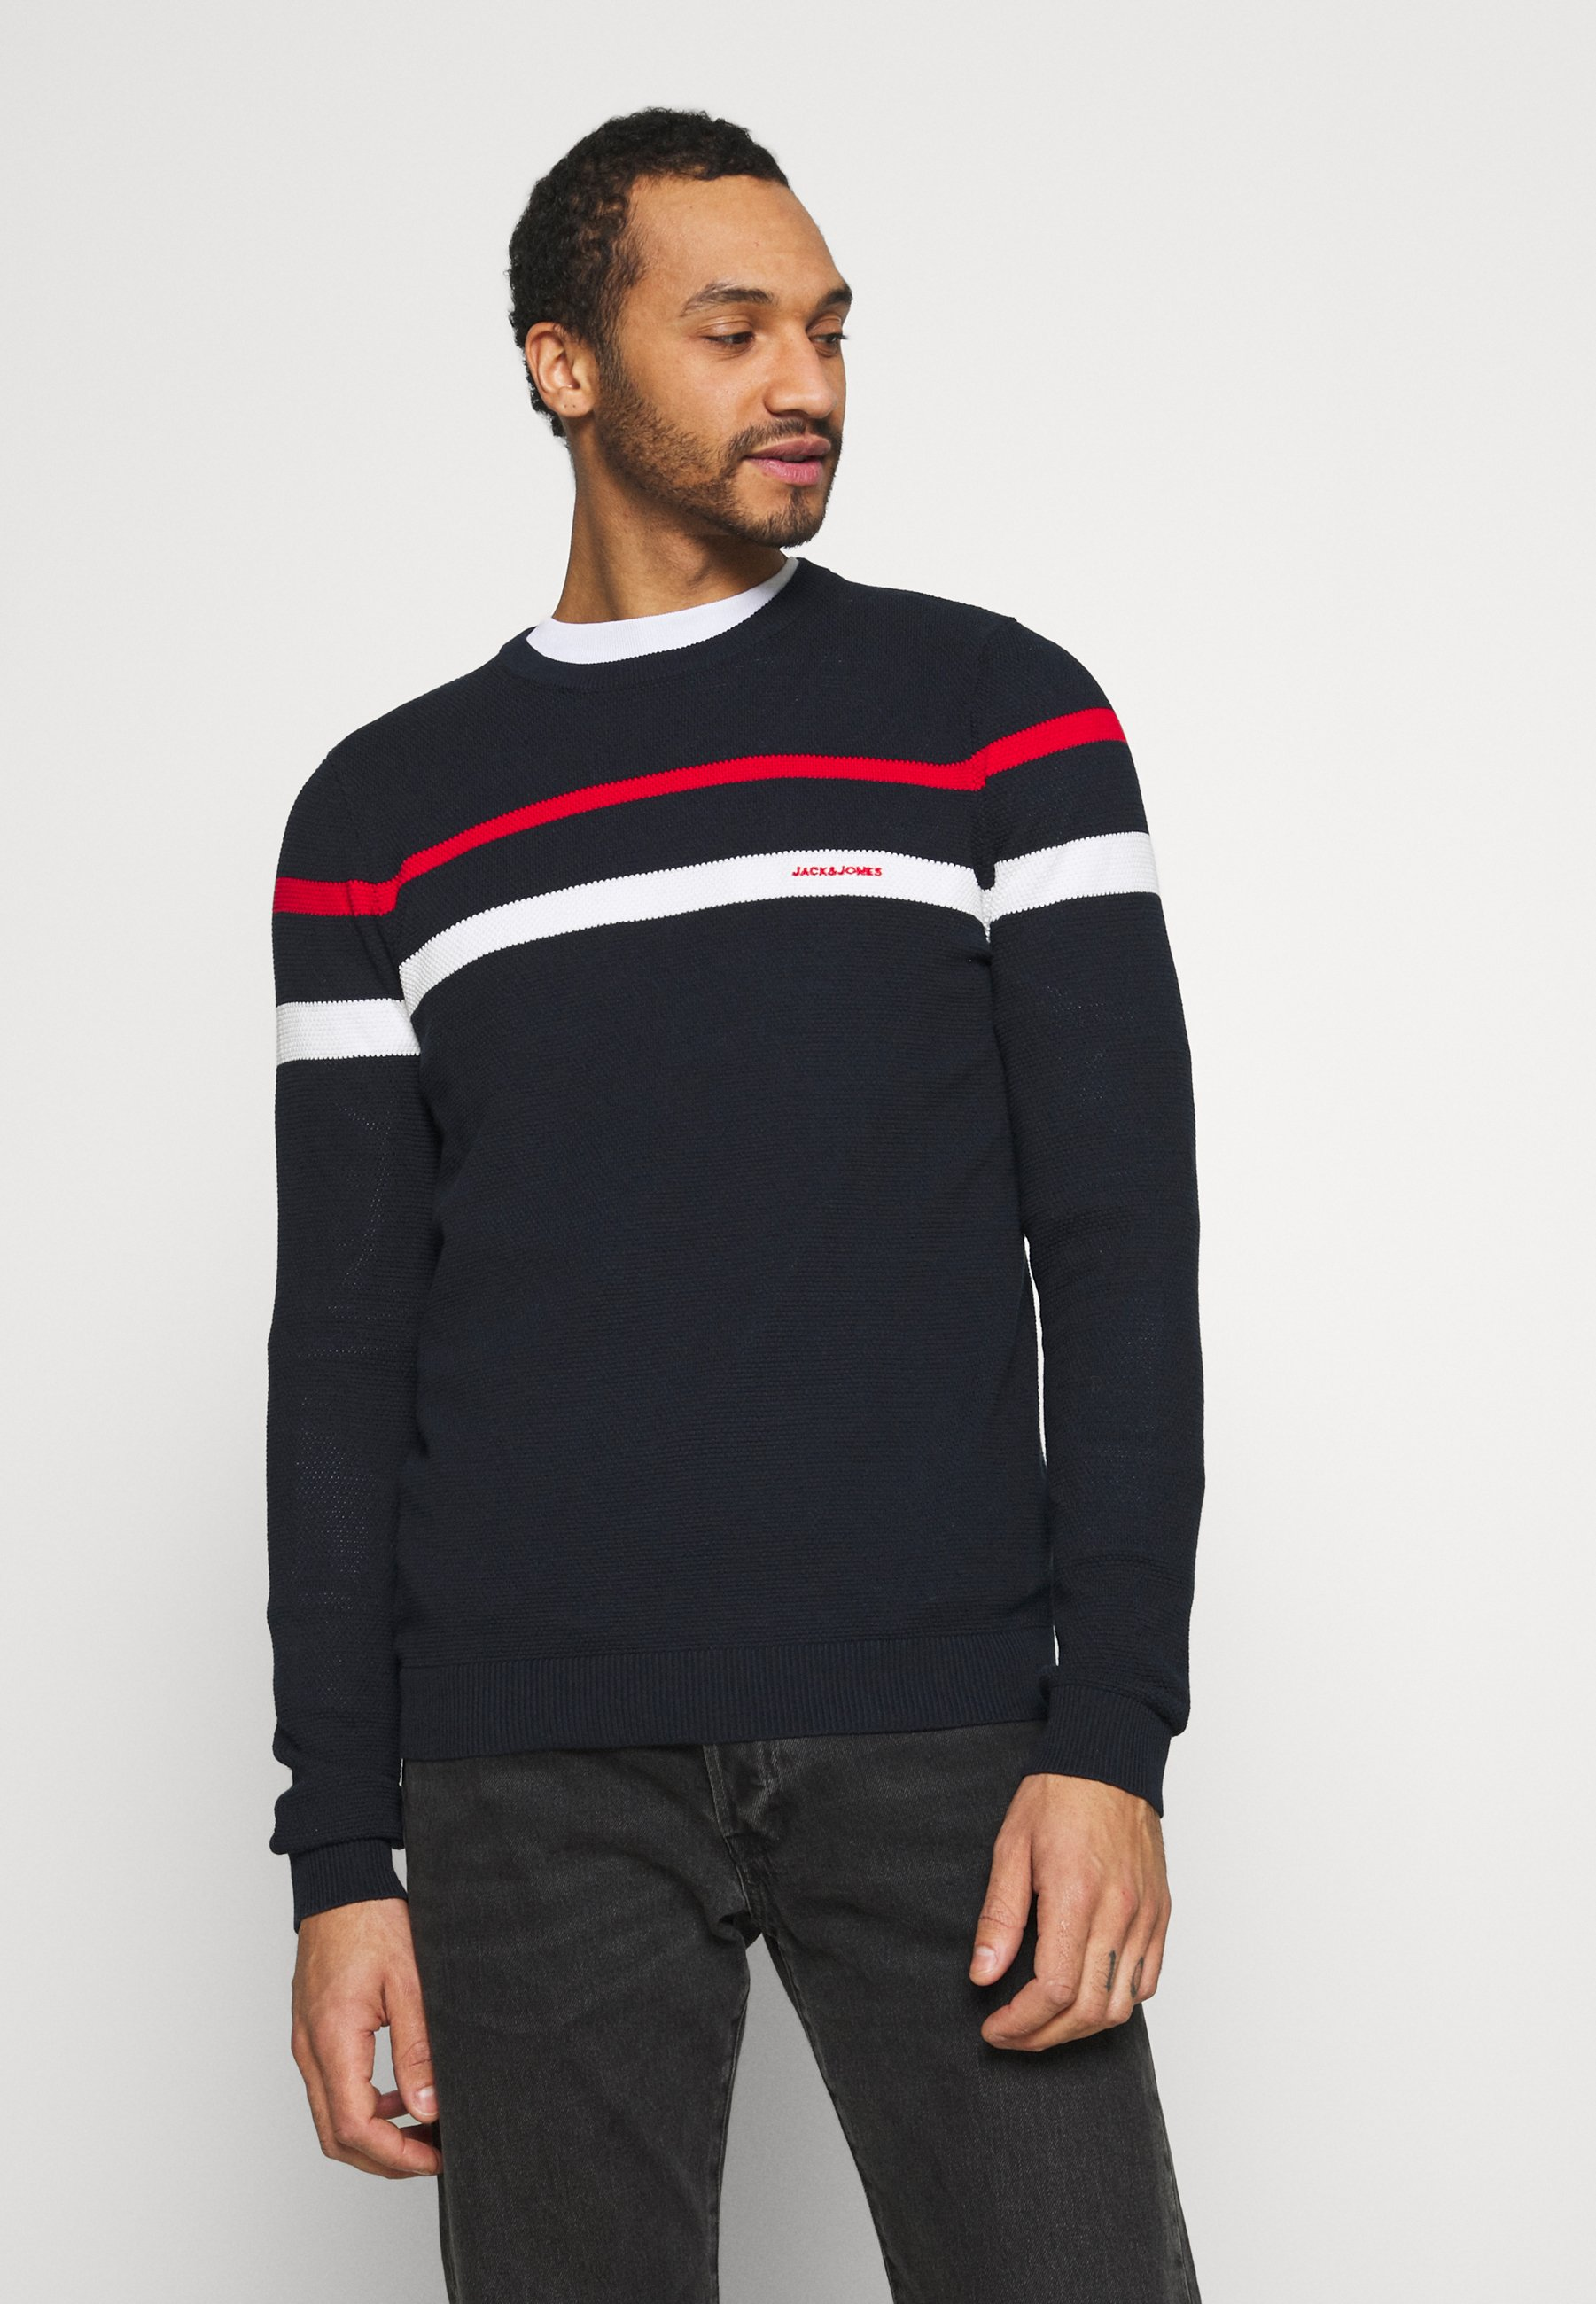 Homme JJSMITH CREW NECK - Pullover